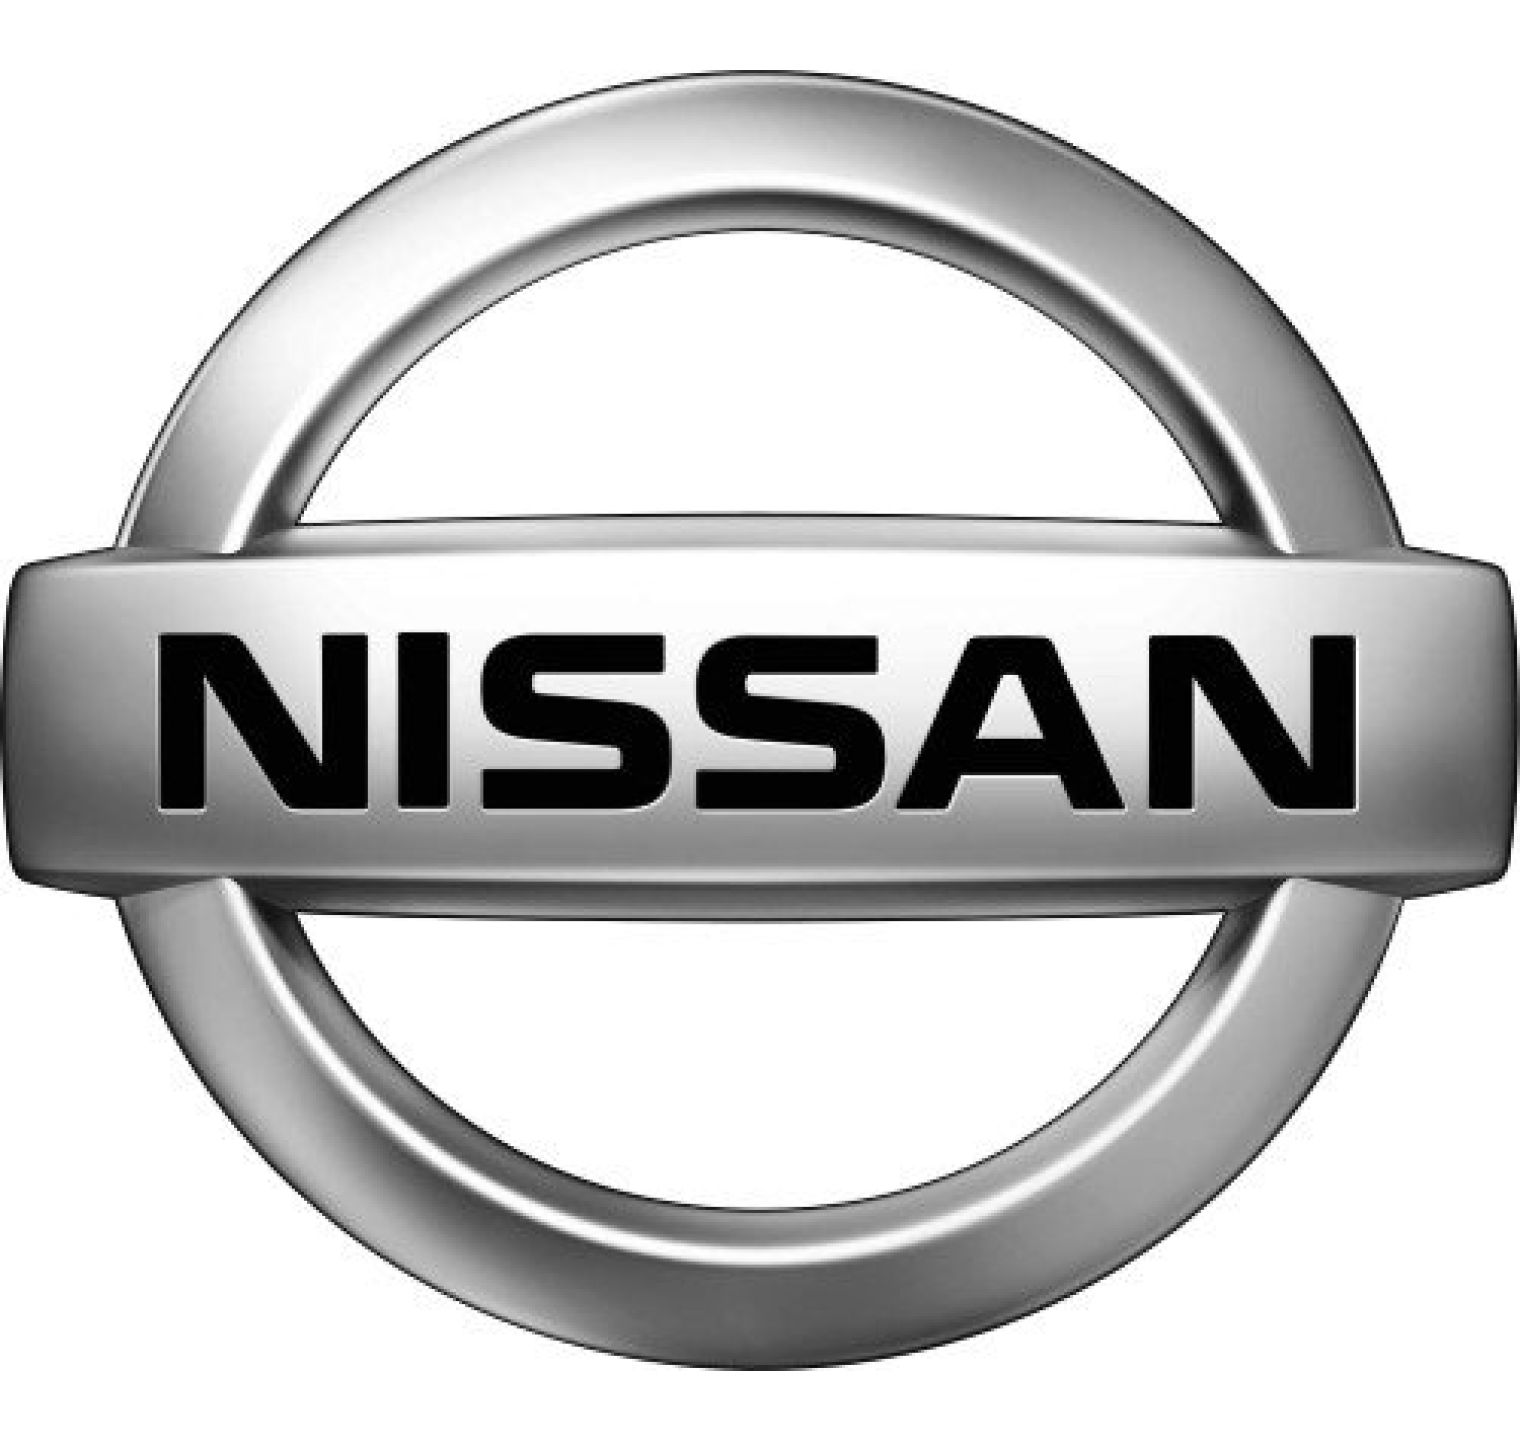 Nissan Sunny I (1982 t/m 1986) - achterruitenwisser Valeo Compact